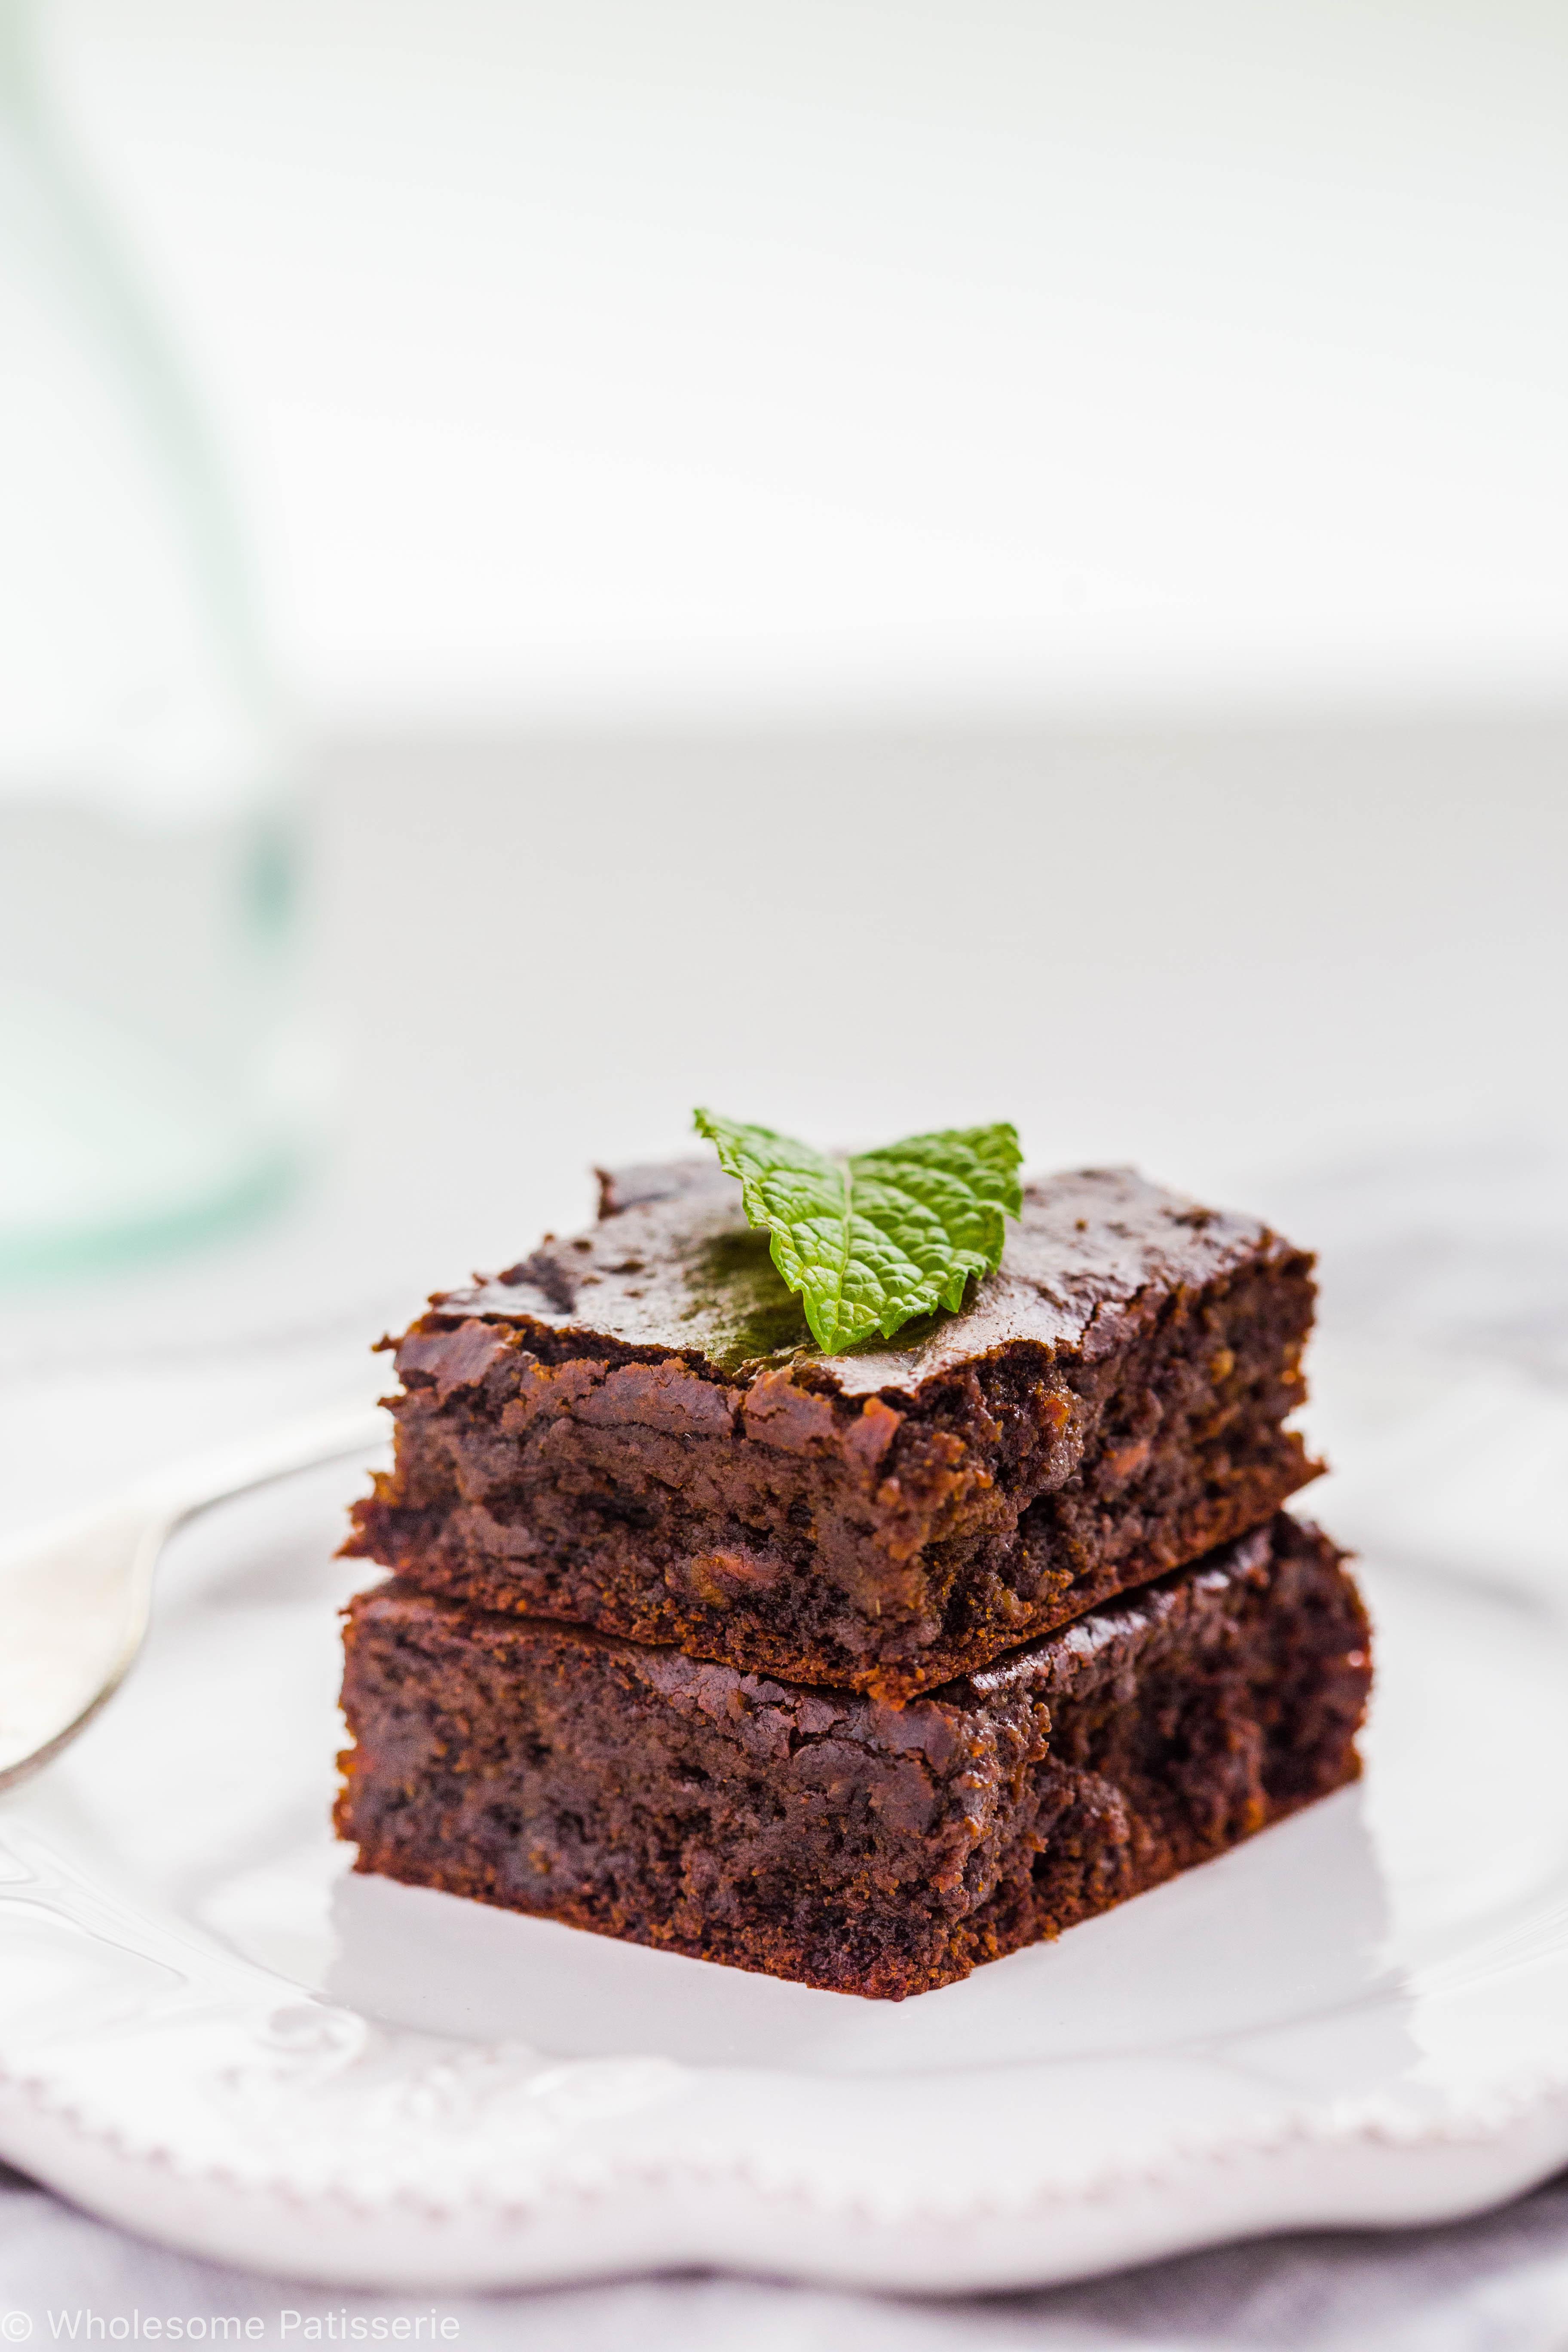 30 Minute Chocolate Mint Brownies